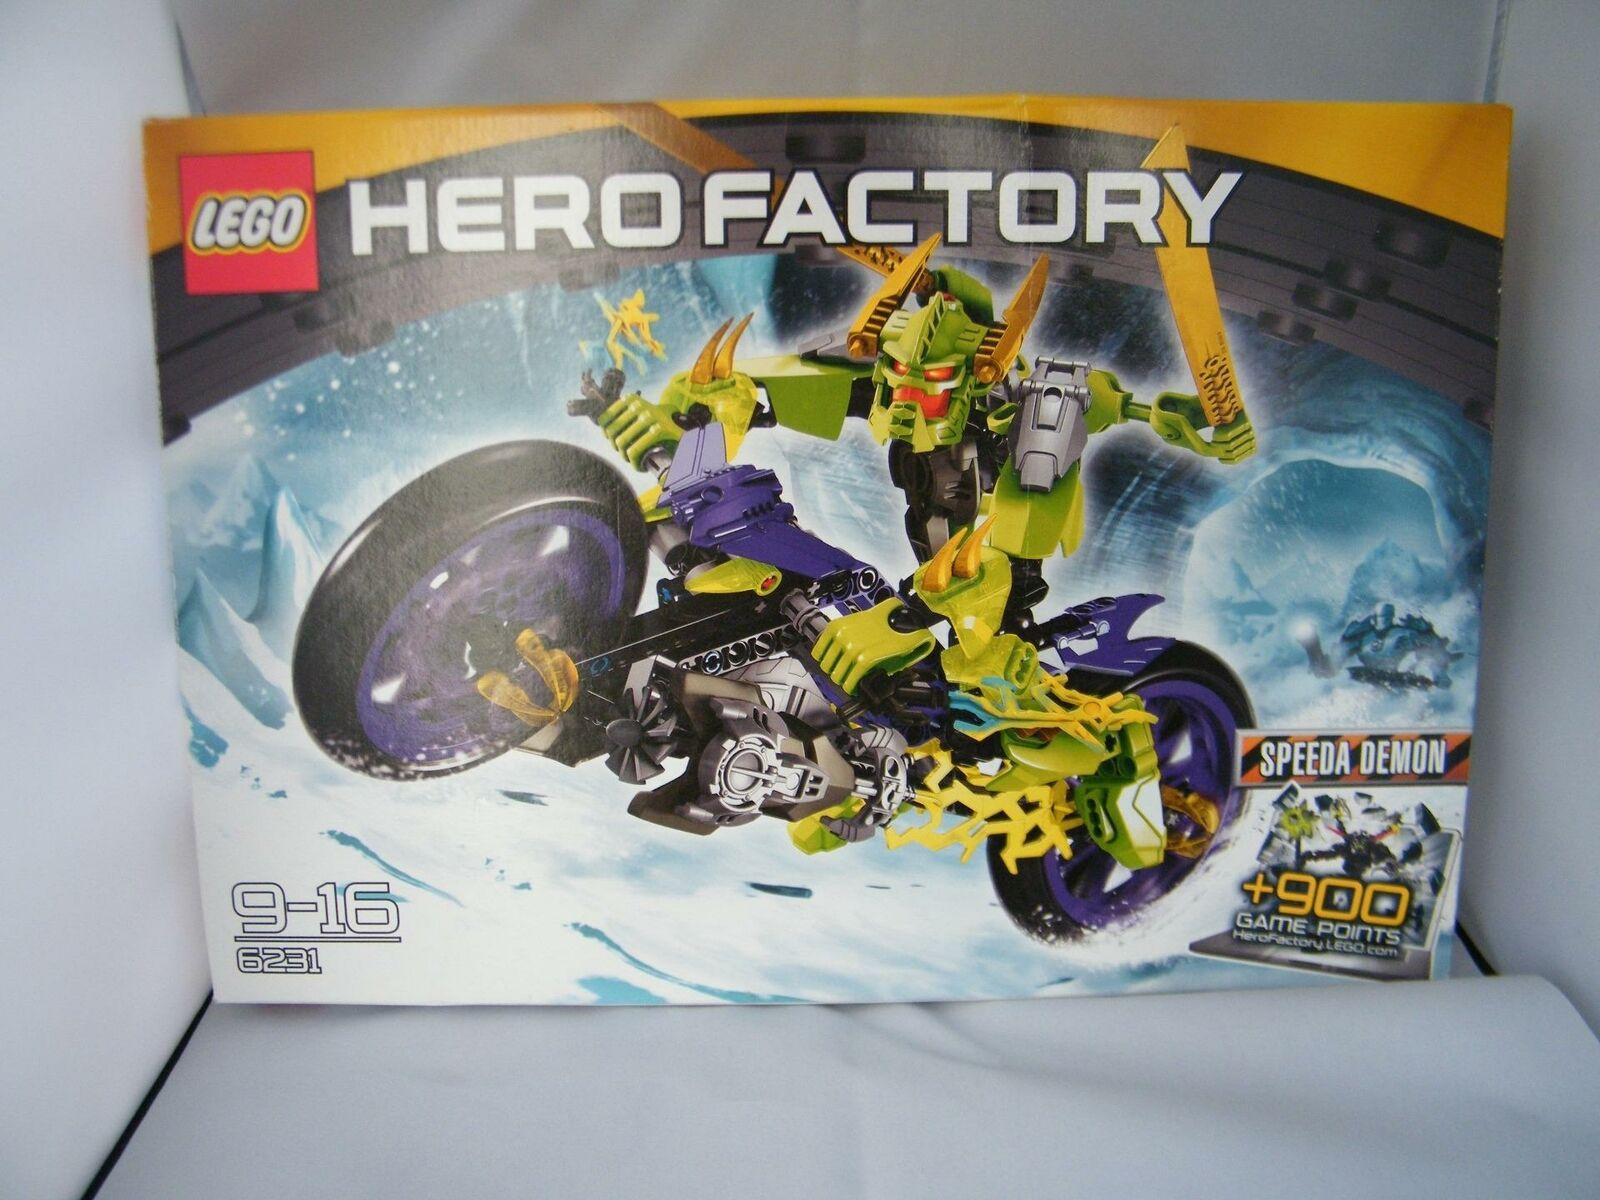 NEW Rare Lego Hero Factory 6231 SPEEDA DEMON Box & Instruction Figure Motorbike